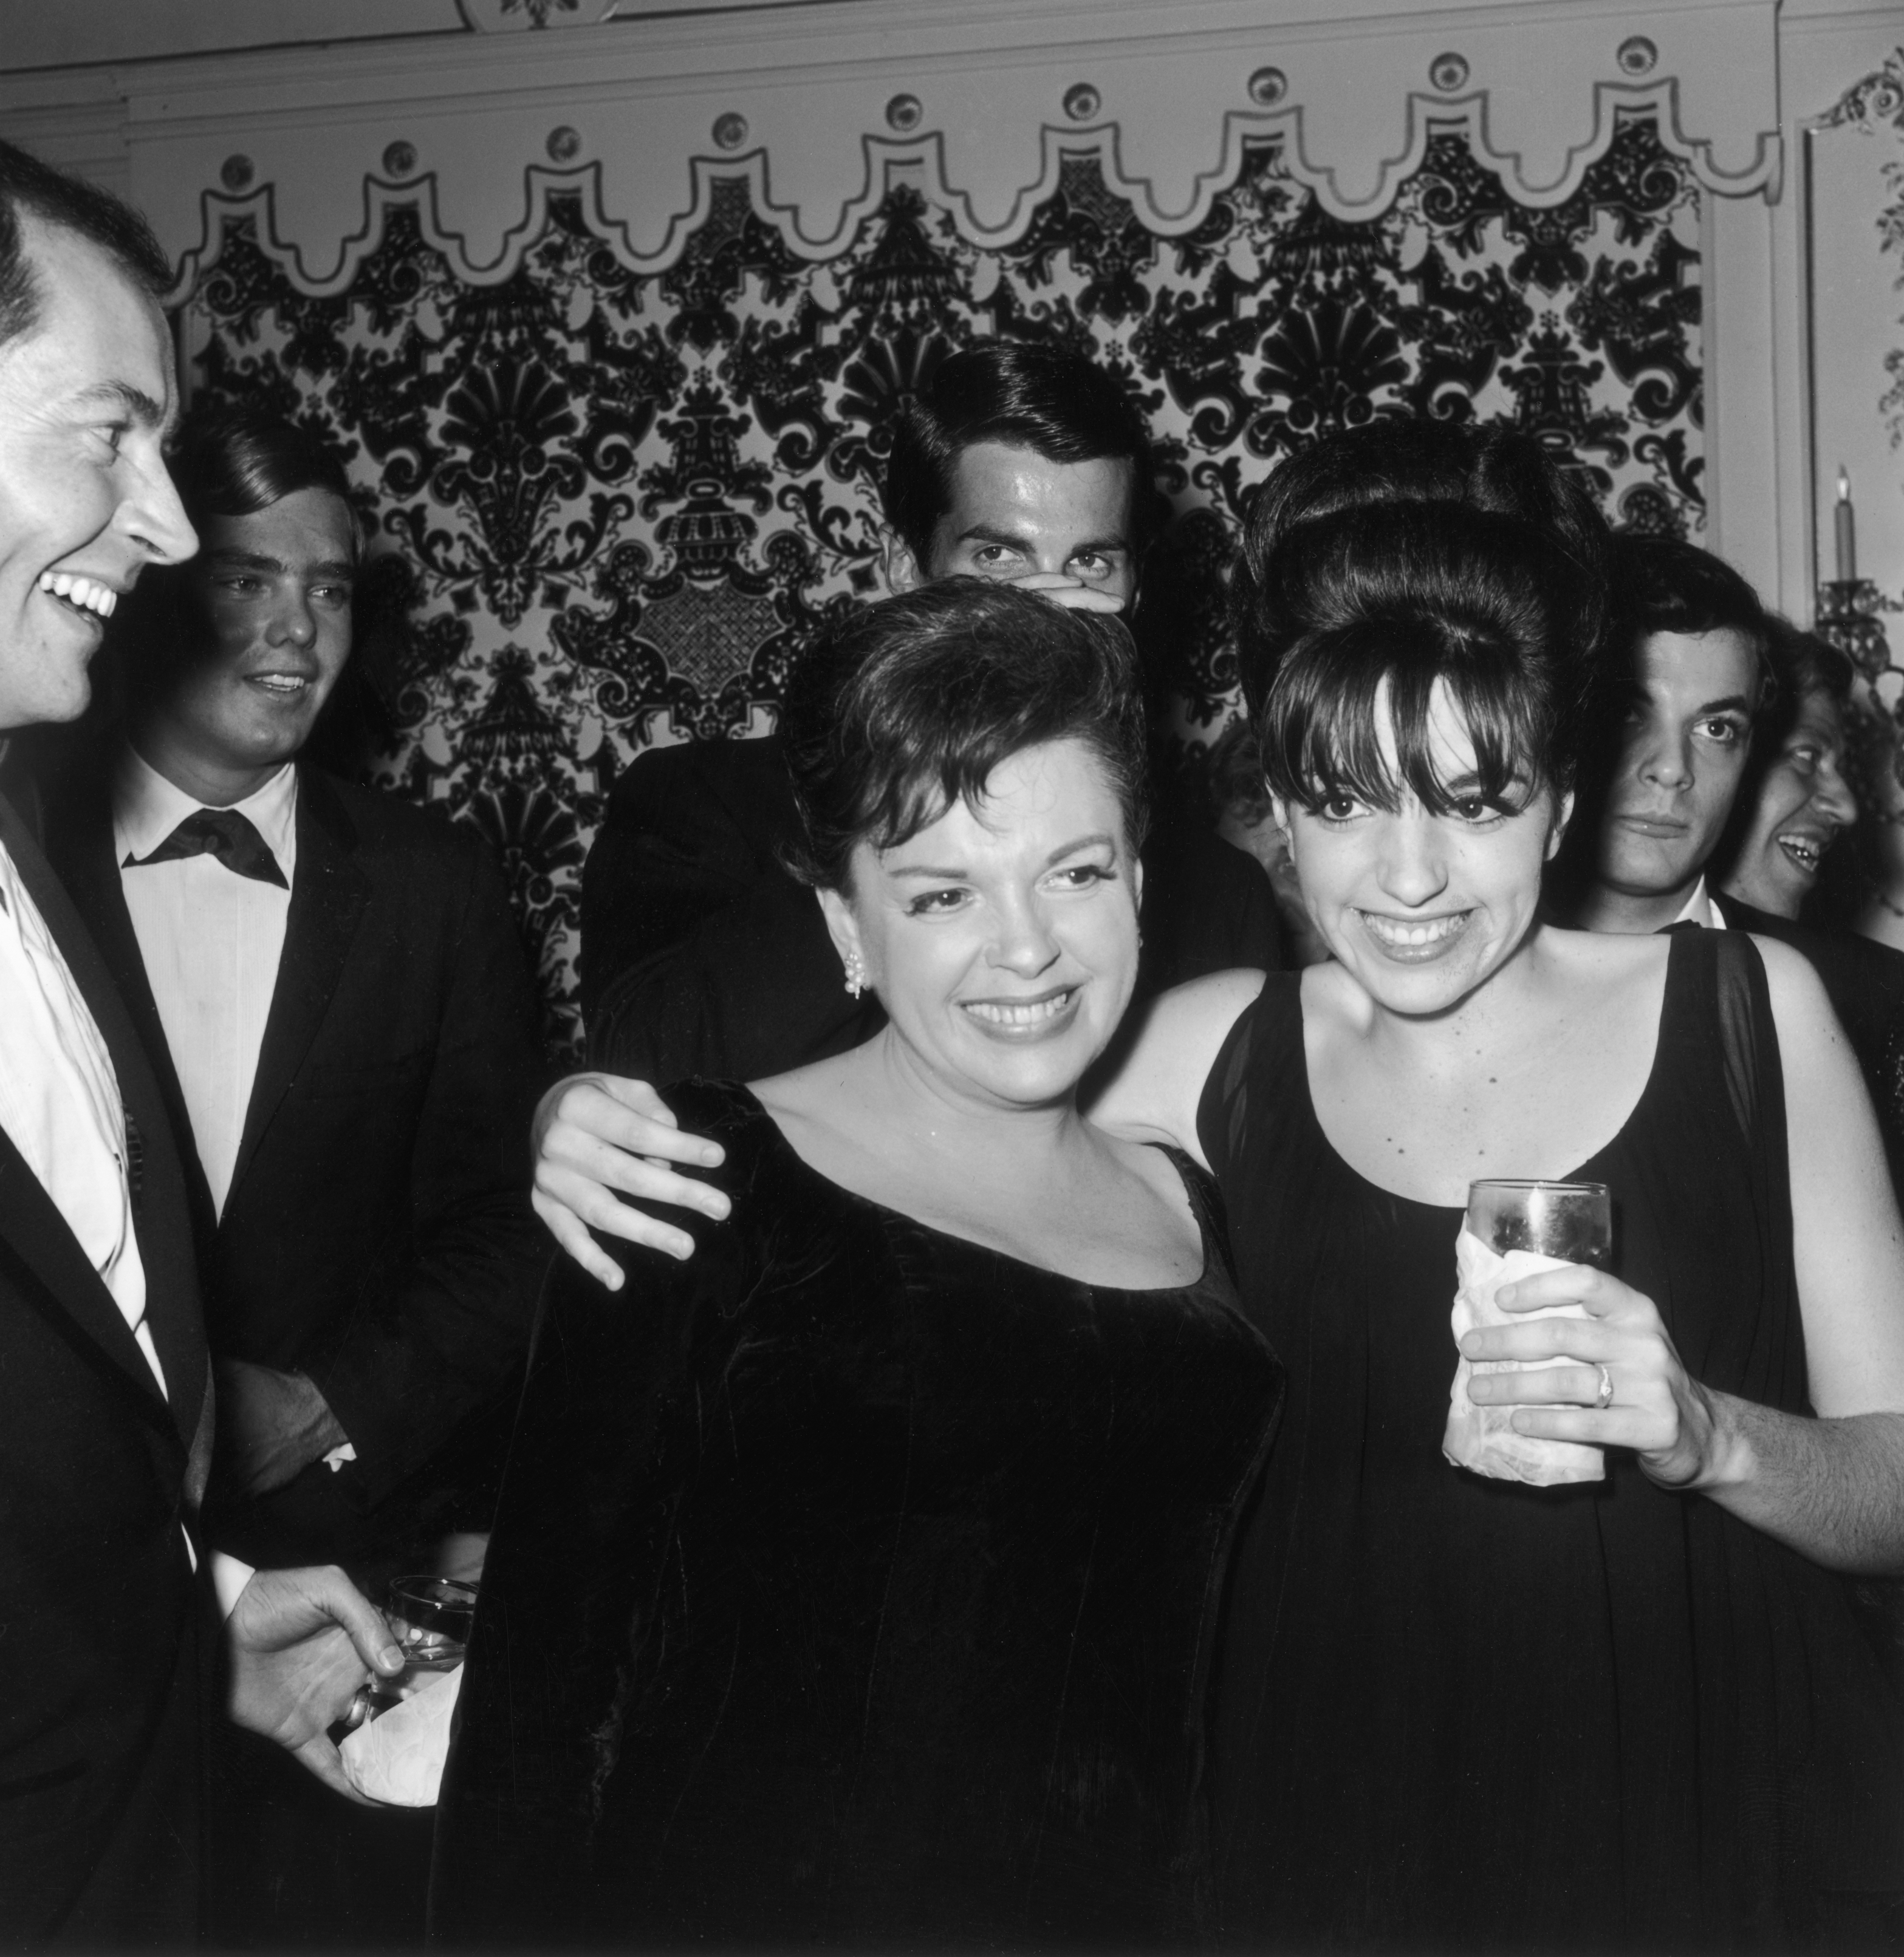 Judy Garland Liza Minelli Na Vespera Do Oscar Liza Minelli Ainda Se Recusa A Aprovar Judy Claudia